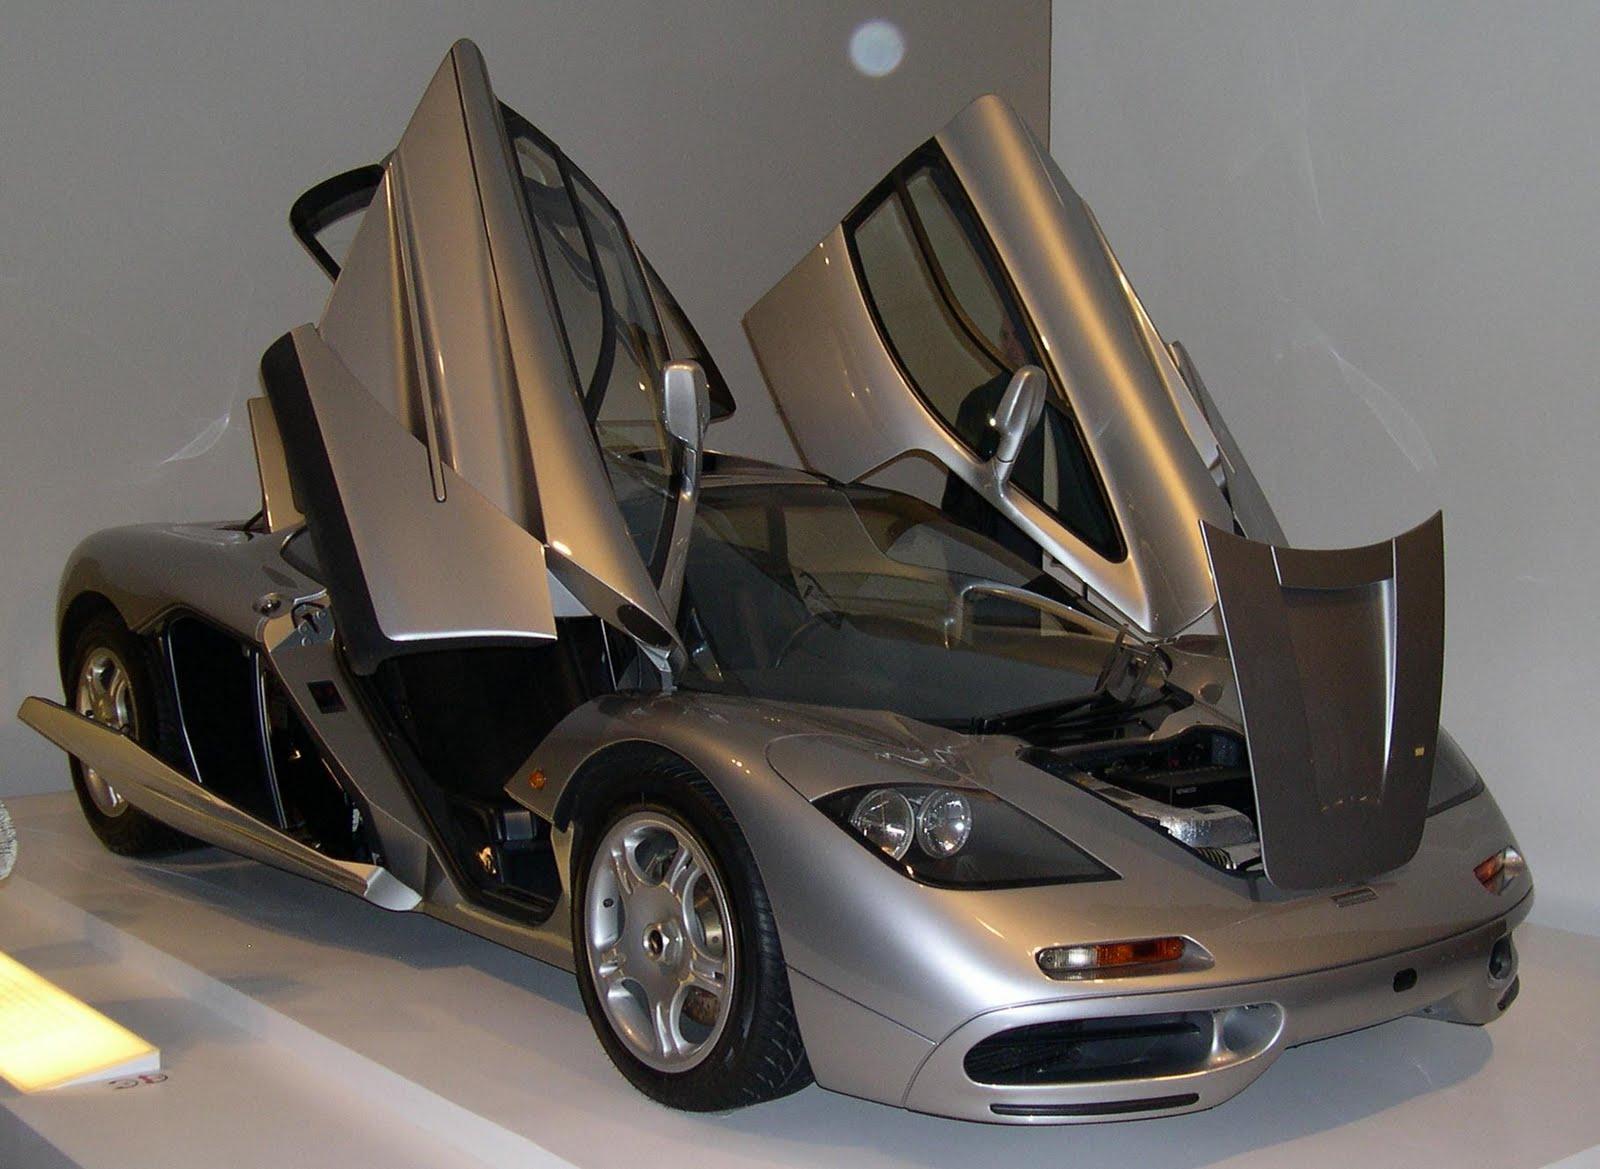 http://1.bp.blogspot.com/-kCu3PrxQnz4/TmV9fsqs6KI/AAAAAAAAAeM/WOm3B8SCE9w/s1600/1996_McLaren_F1_open.jpg